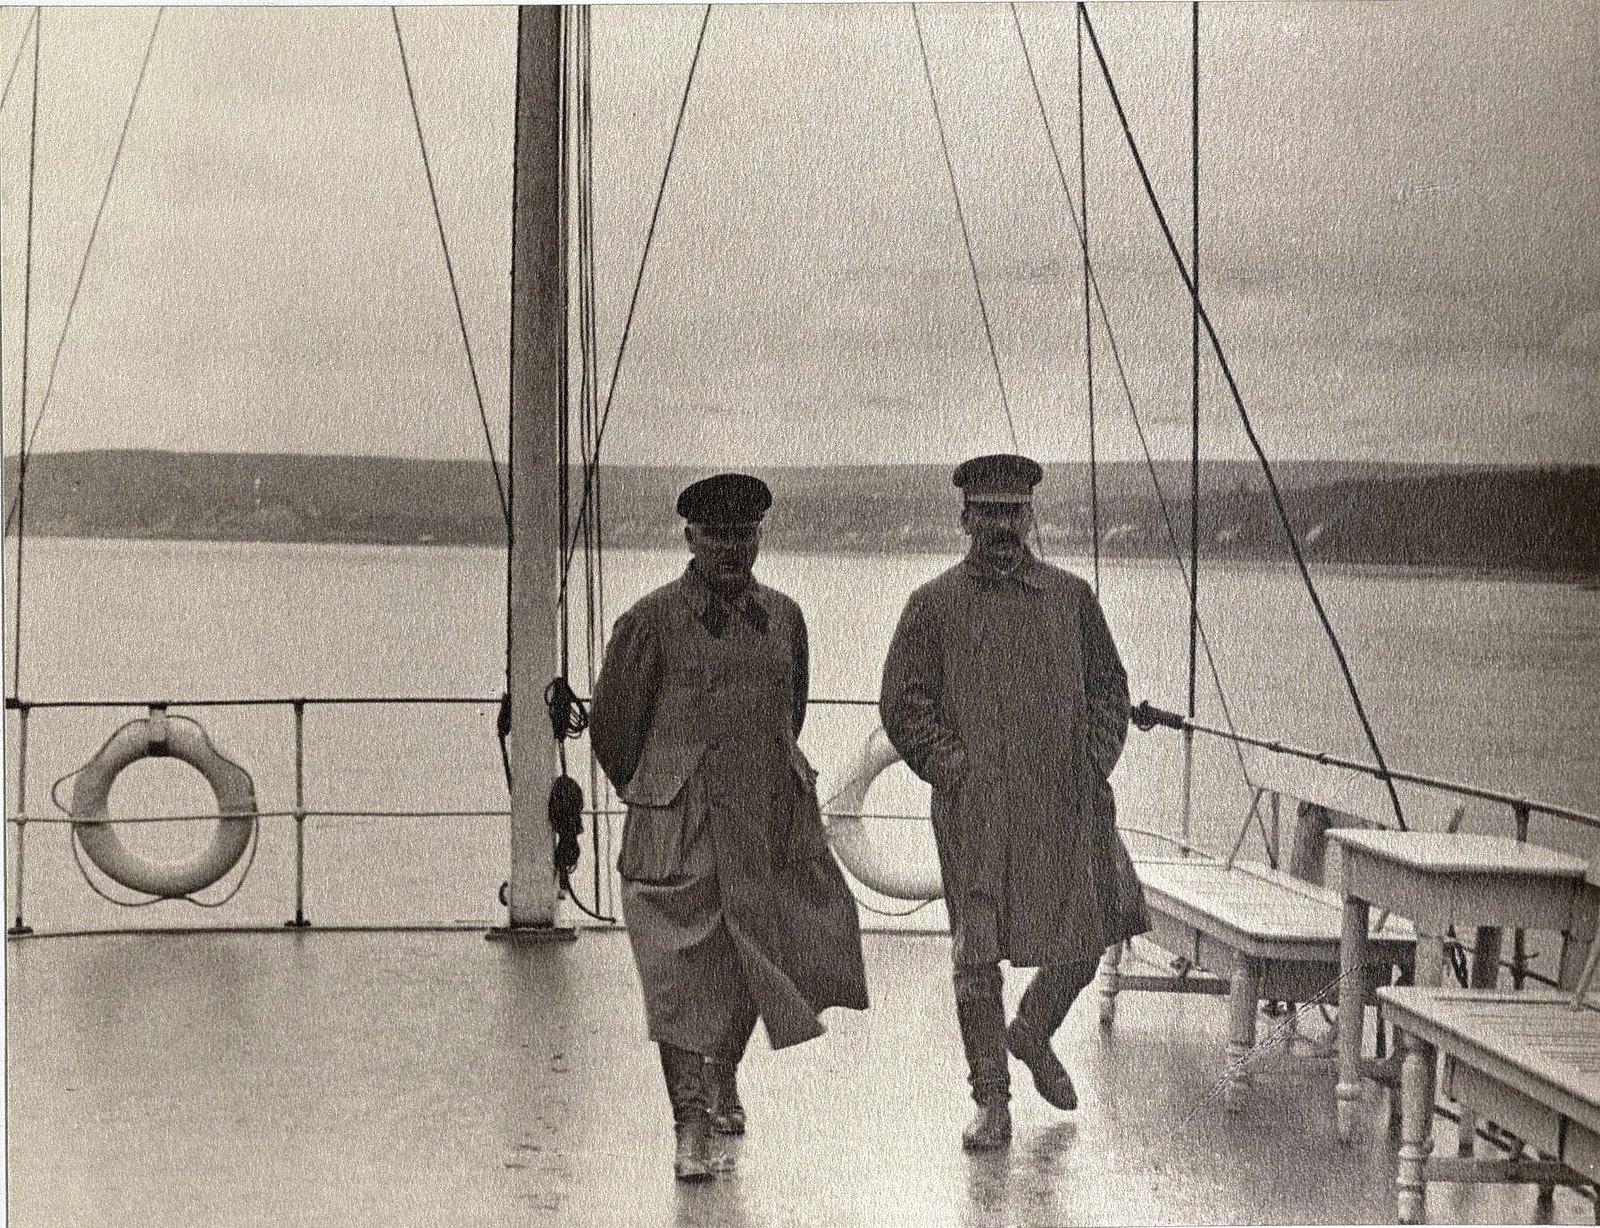 41. И.В. Сталин, К.Е. Ворошилов на теплоходе. Август 1933